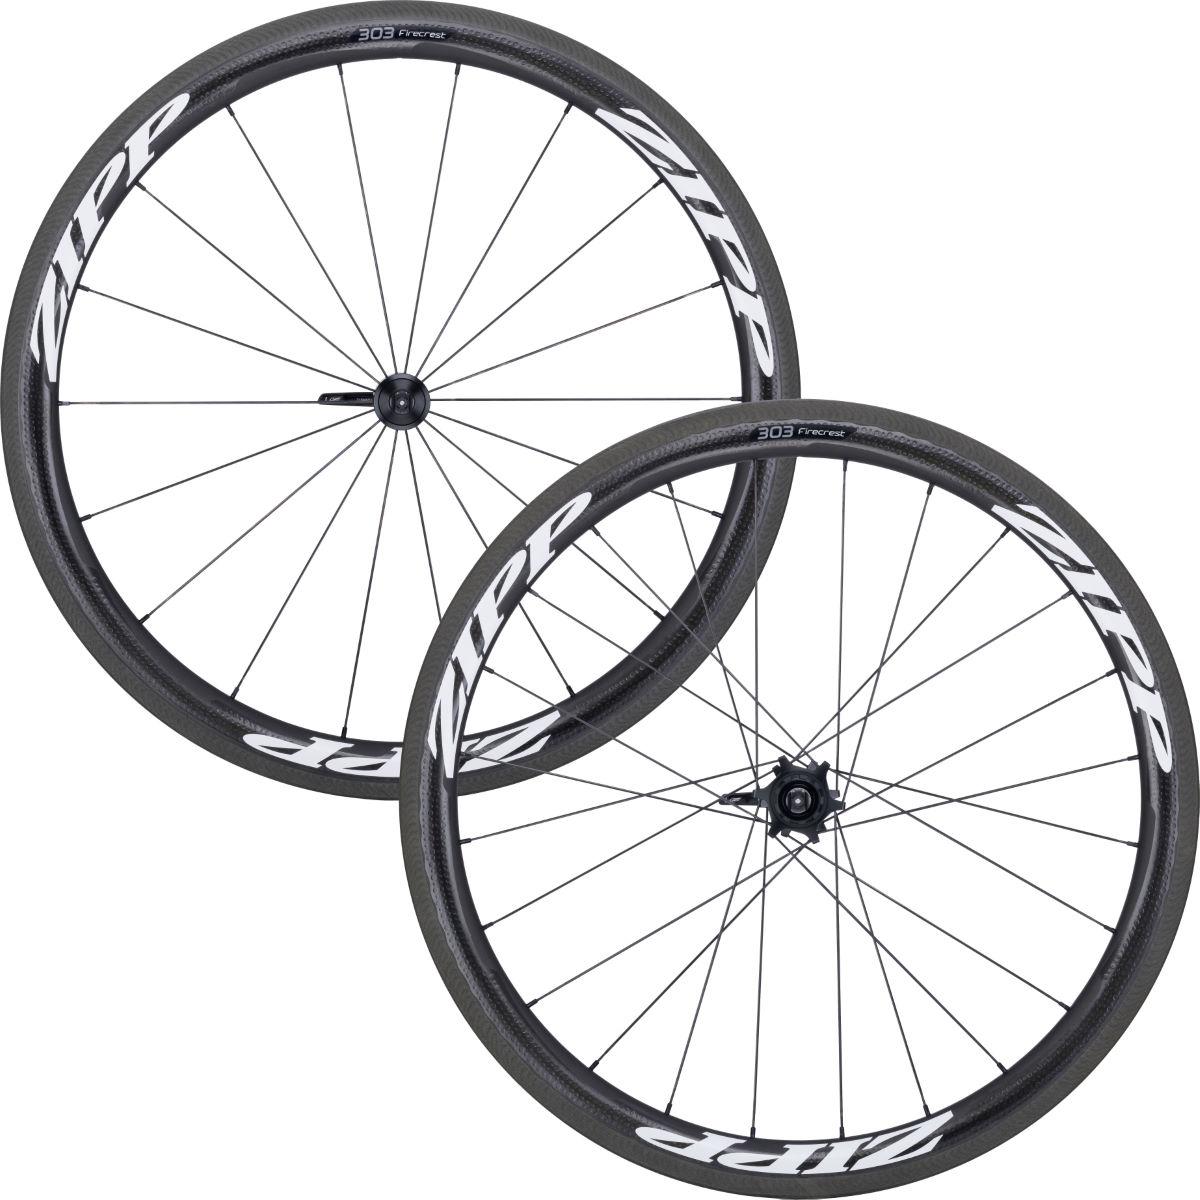 Zipp 303 Carbon Clincher Wheels Shimano Wheel Sets